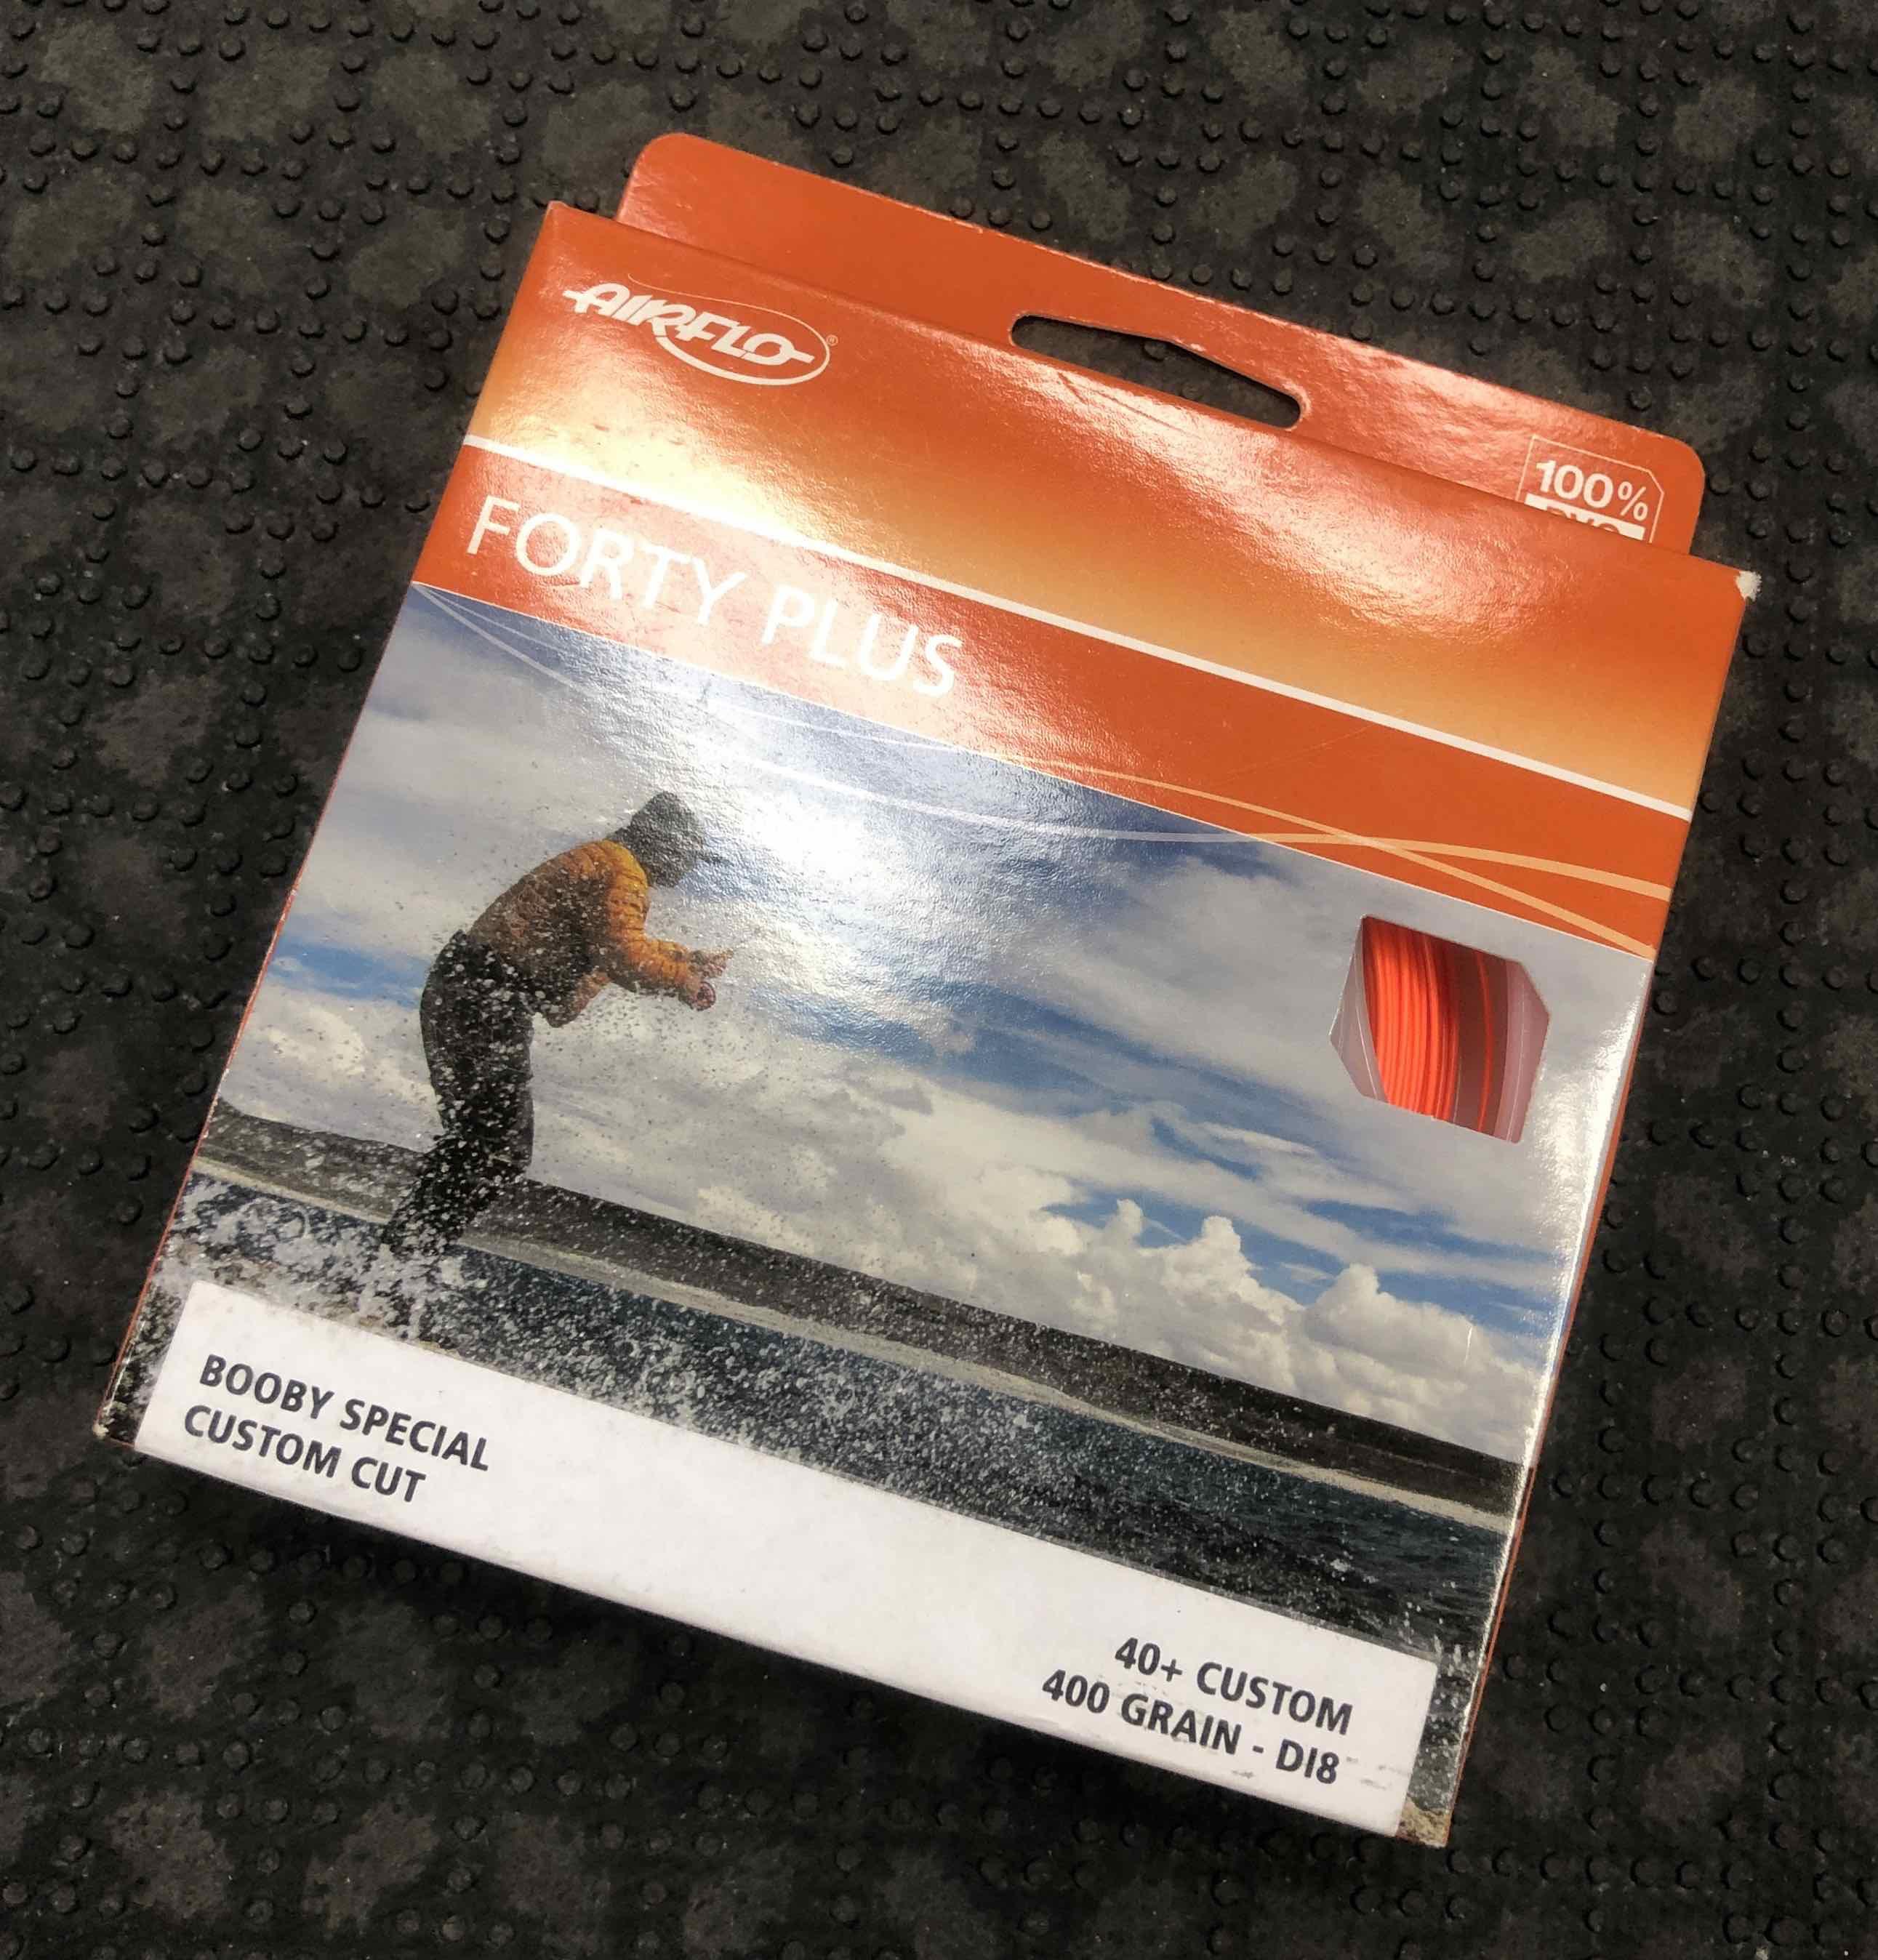 Airflo Booby Special Custom Cut Fly Line 40+ Custom 400 Grain DI8 - BRAND NEW IN BOX! - $50